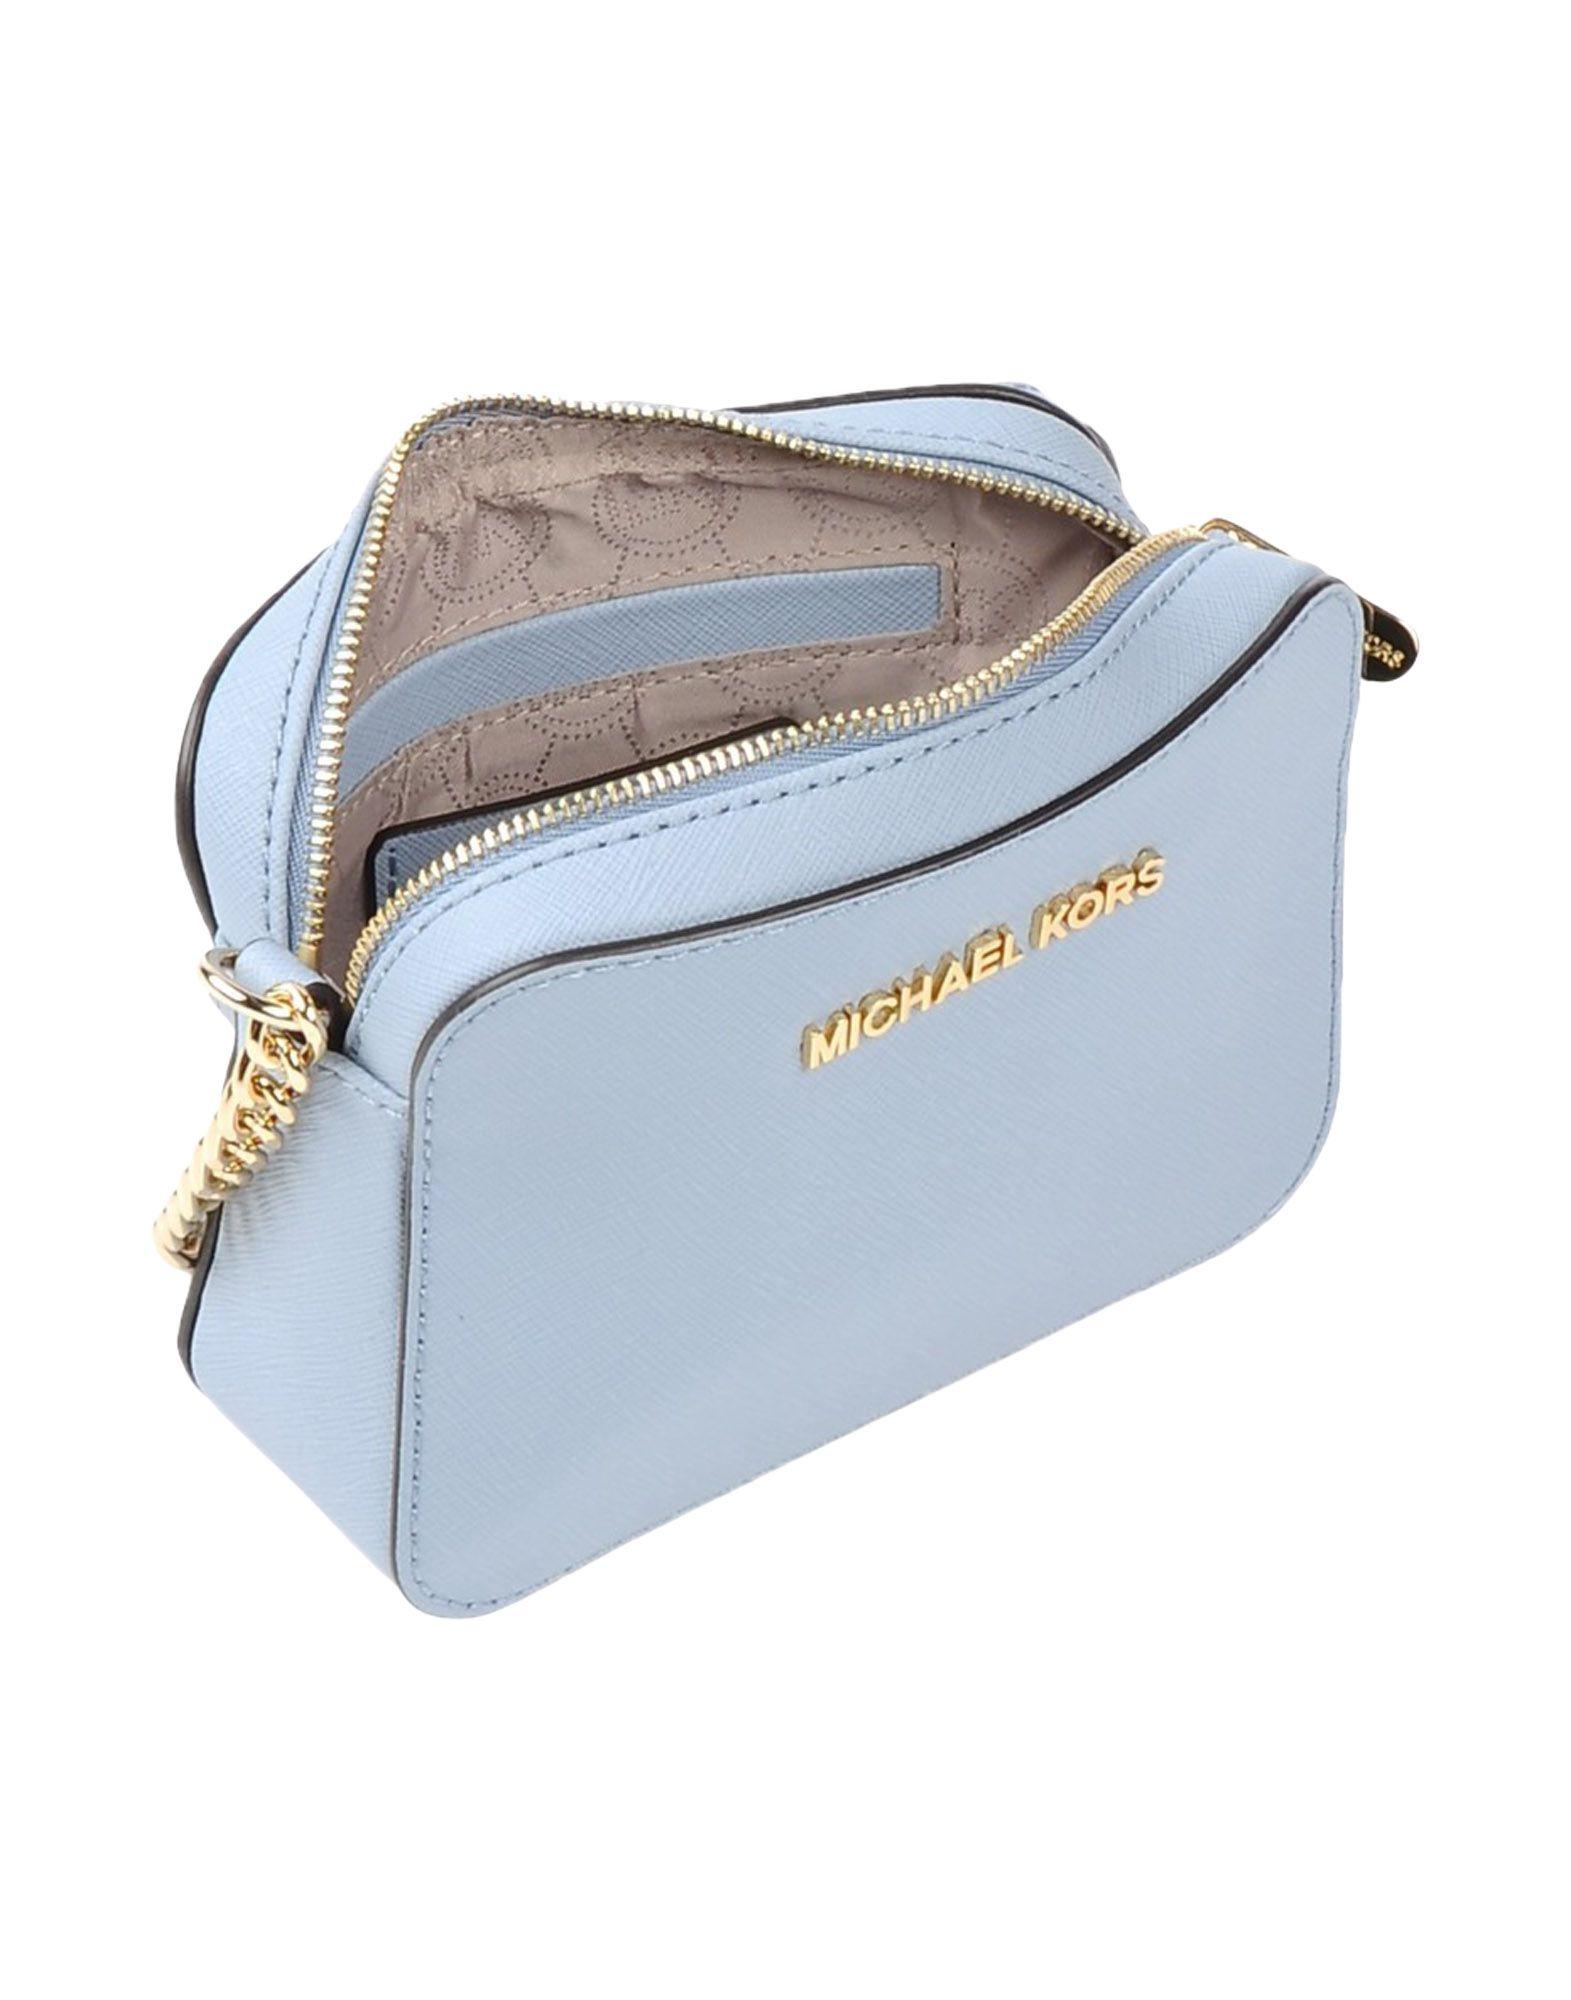 41c3864106 Michael Kors Sky Blue Handbags - Best Handbag 2018